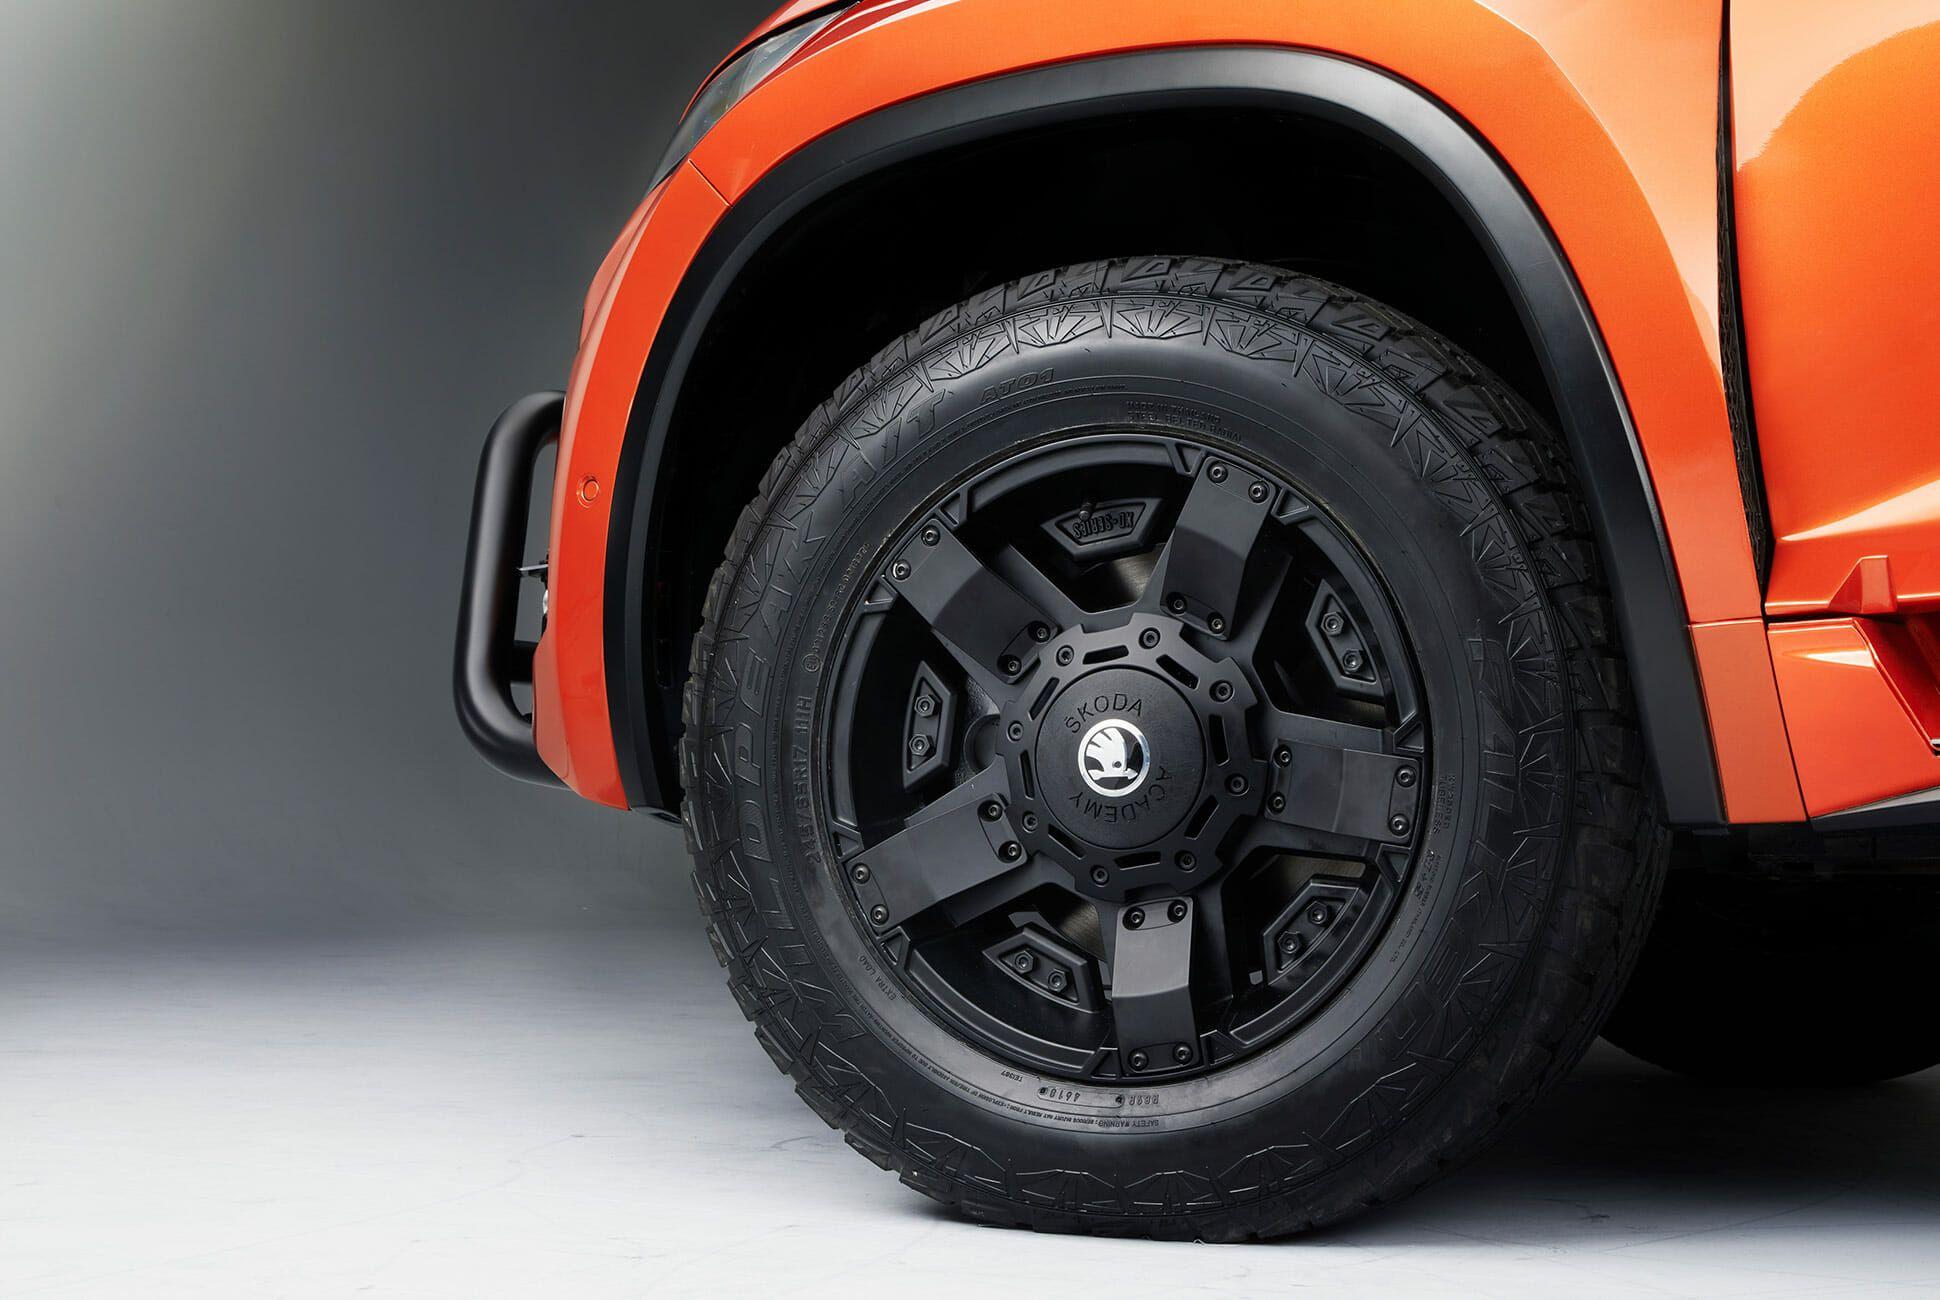 Skoda-Mountiaq-Concept-gear-patrol-slide-9